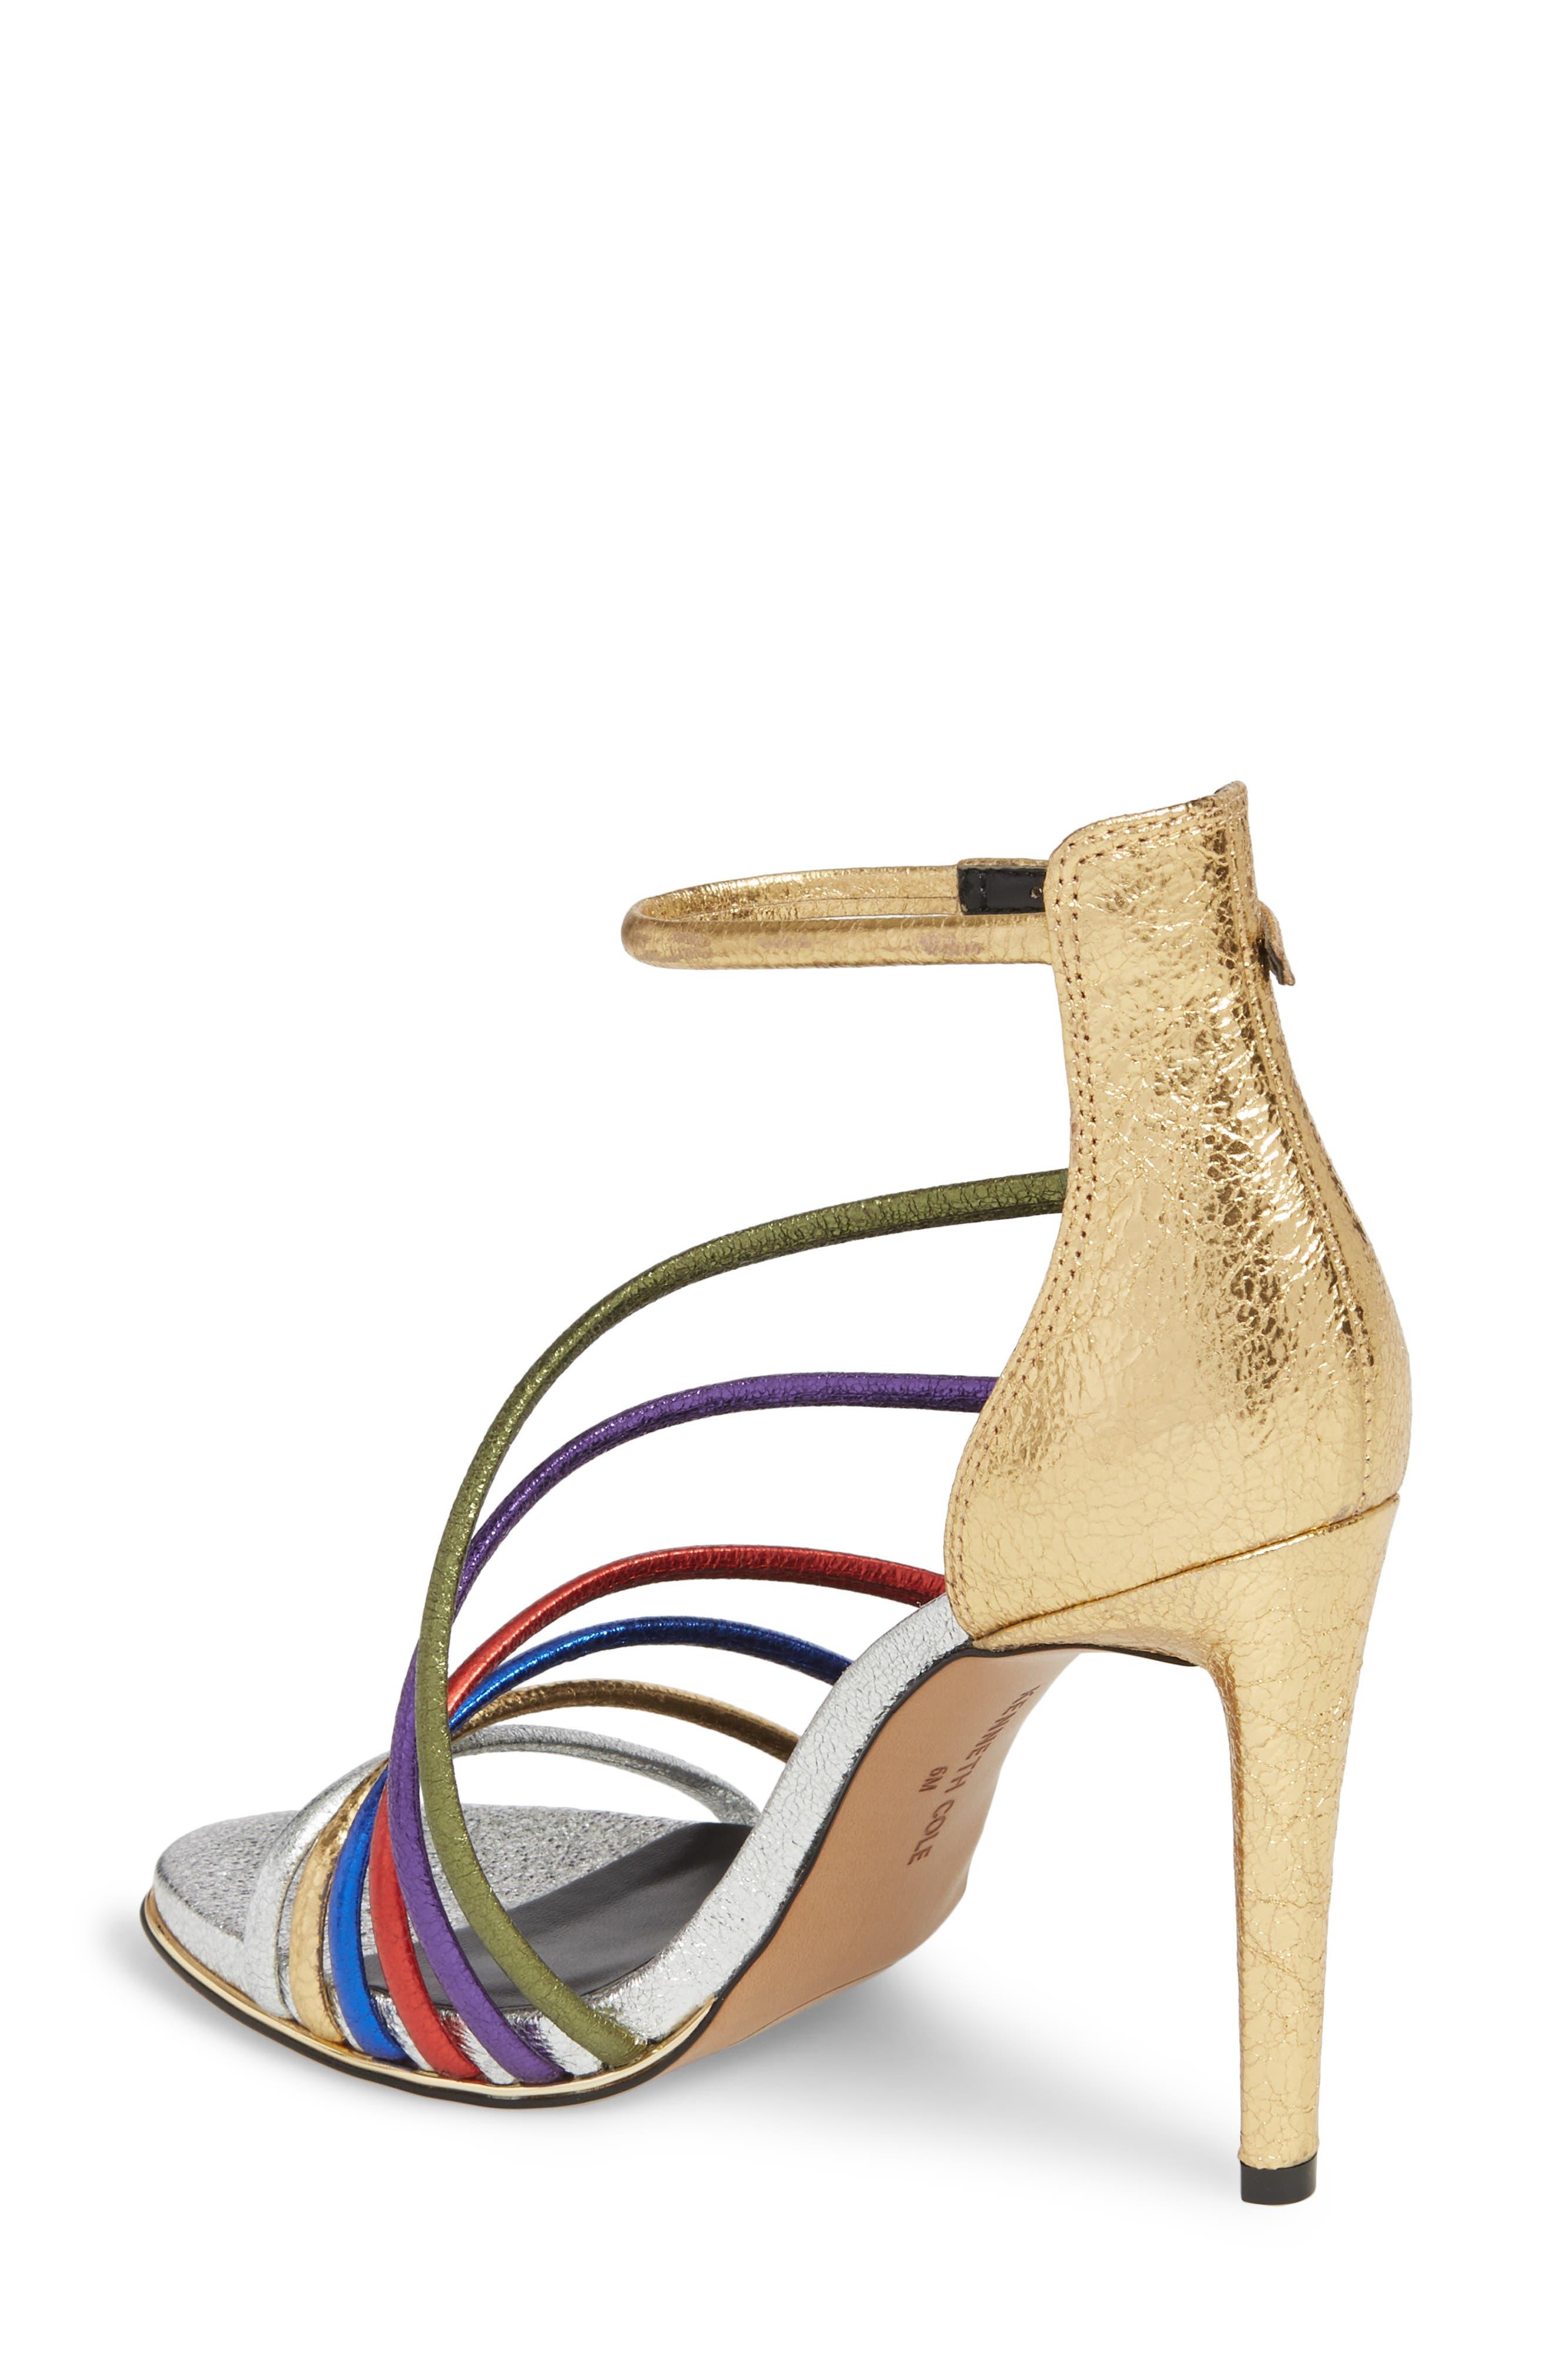 Barletta Asymmetrical Strappy Sandal,                             Alternate thumbnail 2, color,                             MULTI LEATHER